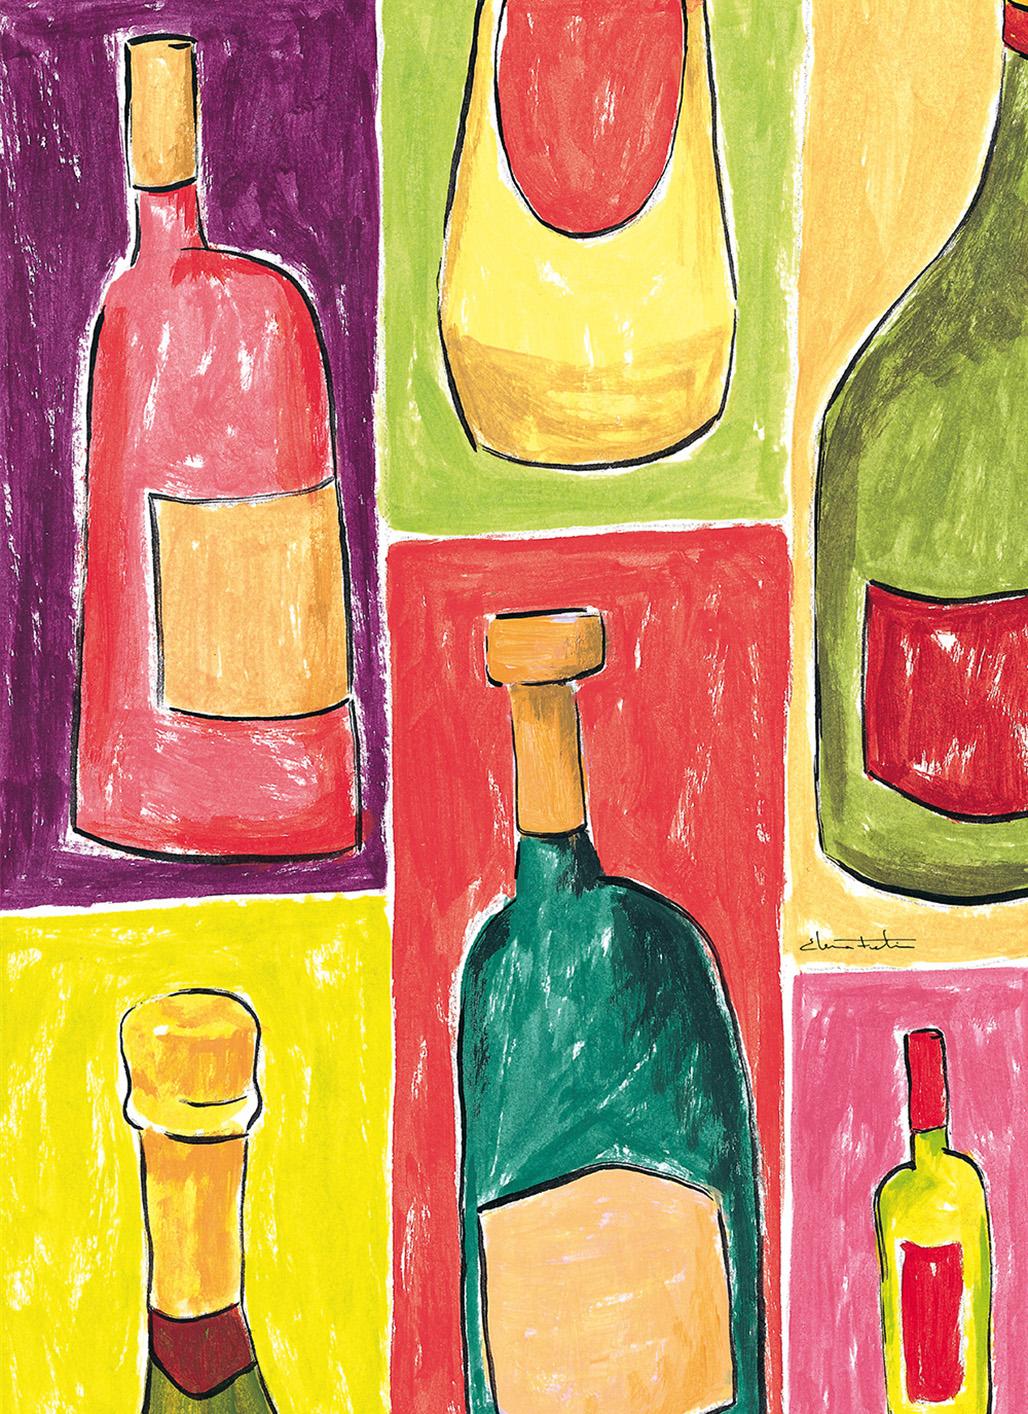 Carta vins restaurant Mas Vell del Masnou